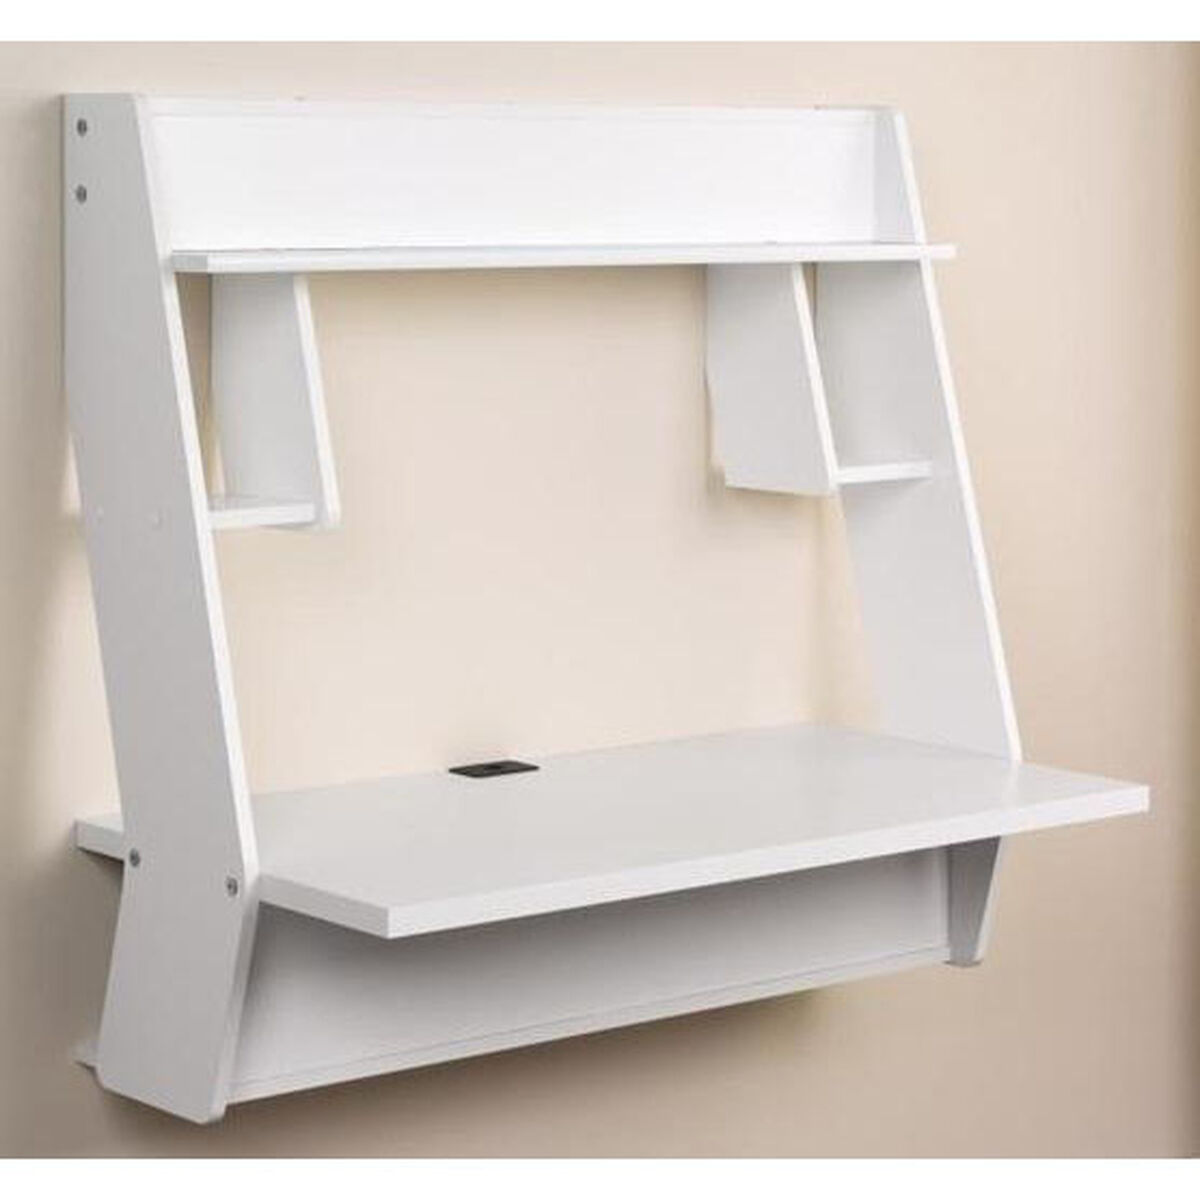 furniture transitional shop storage fresh prepac pd designer white desk floating with